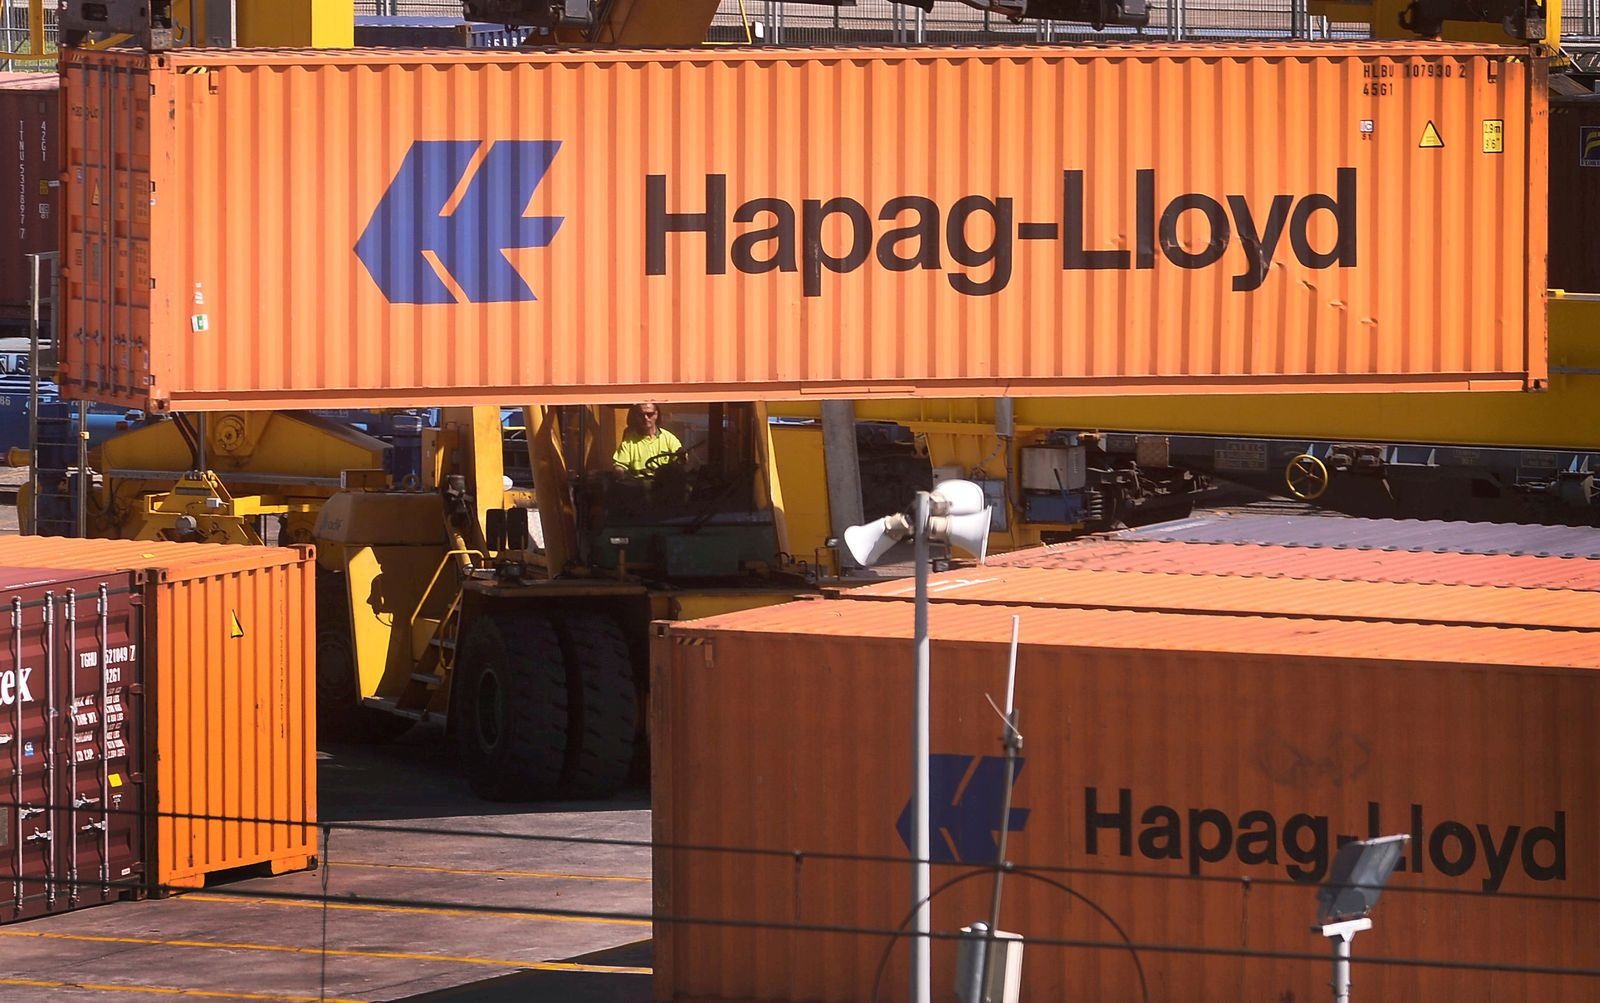 HAPAG LLOYD-OUTLOOK/